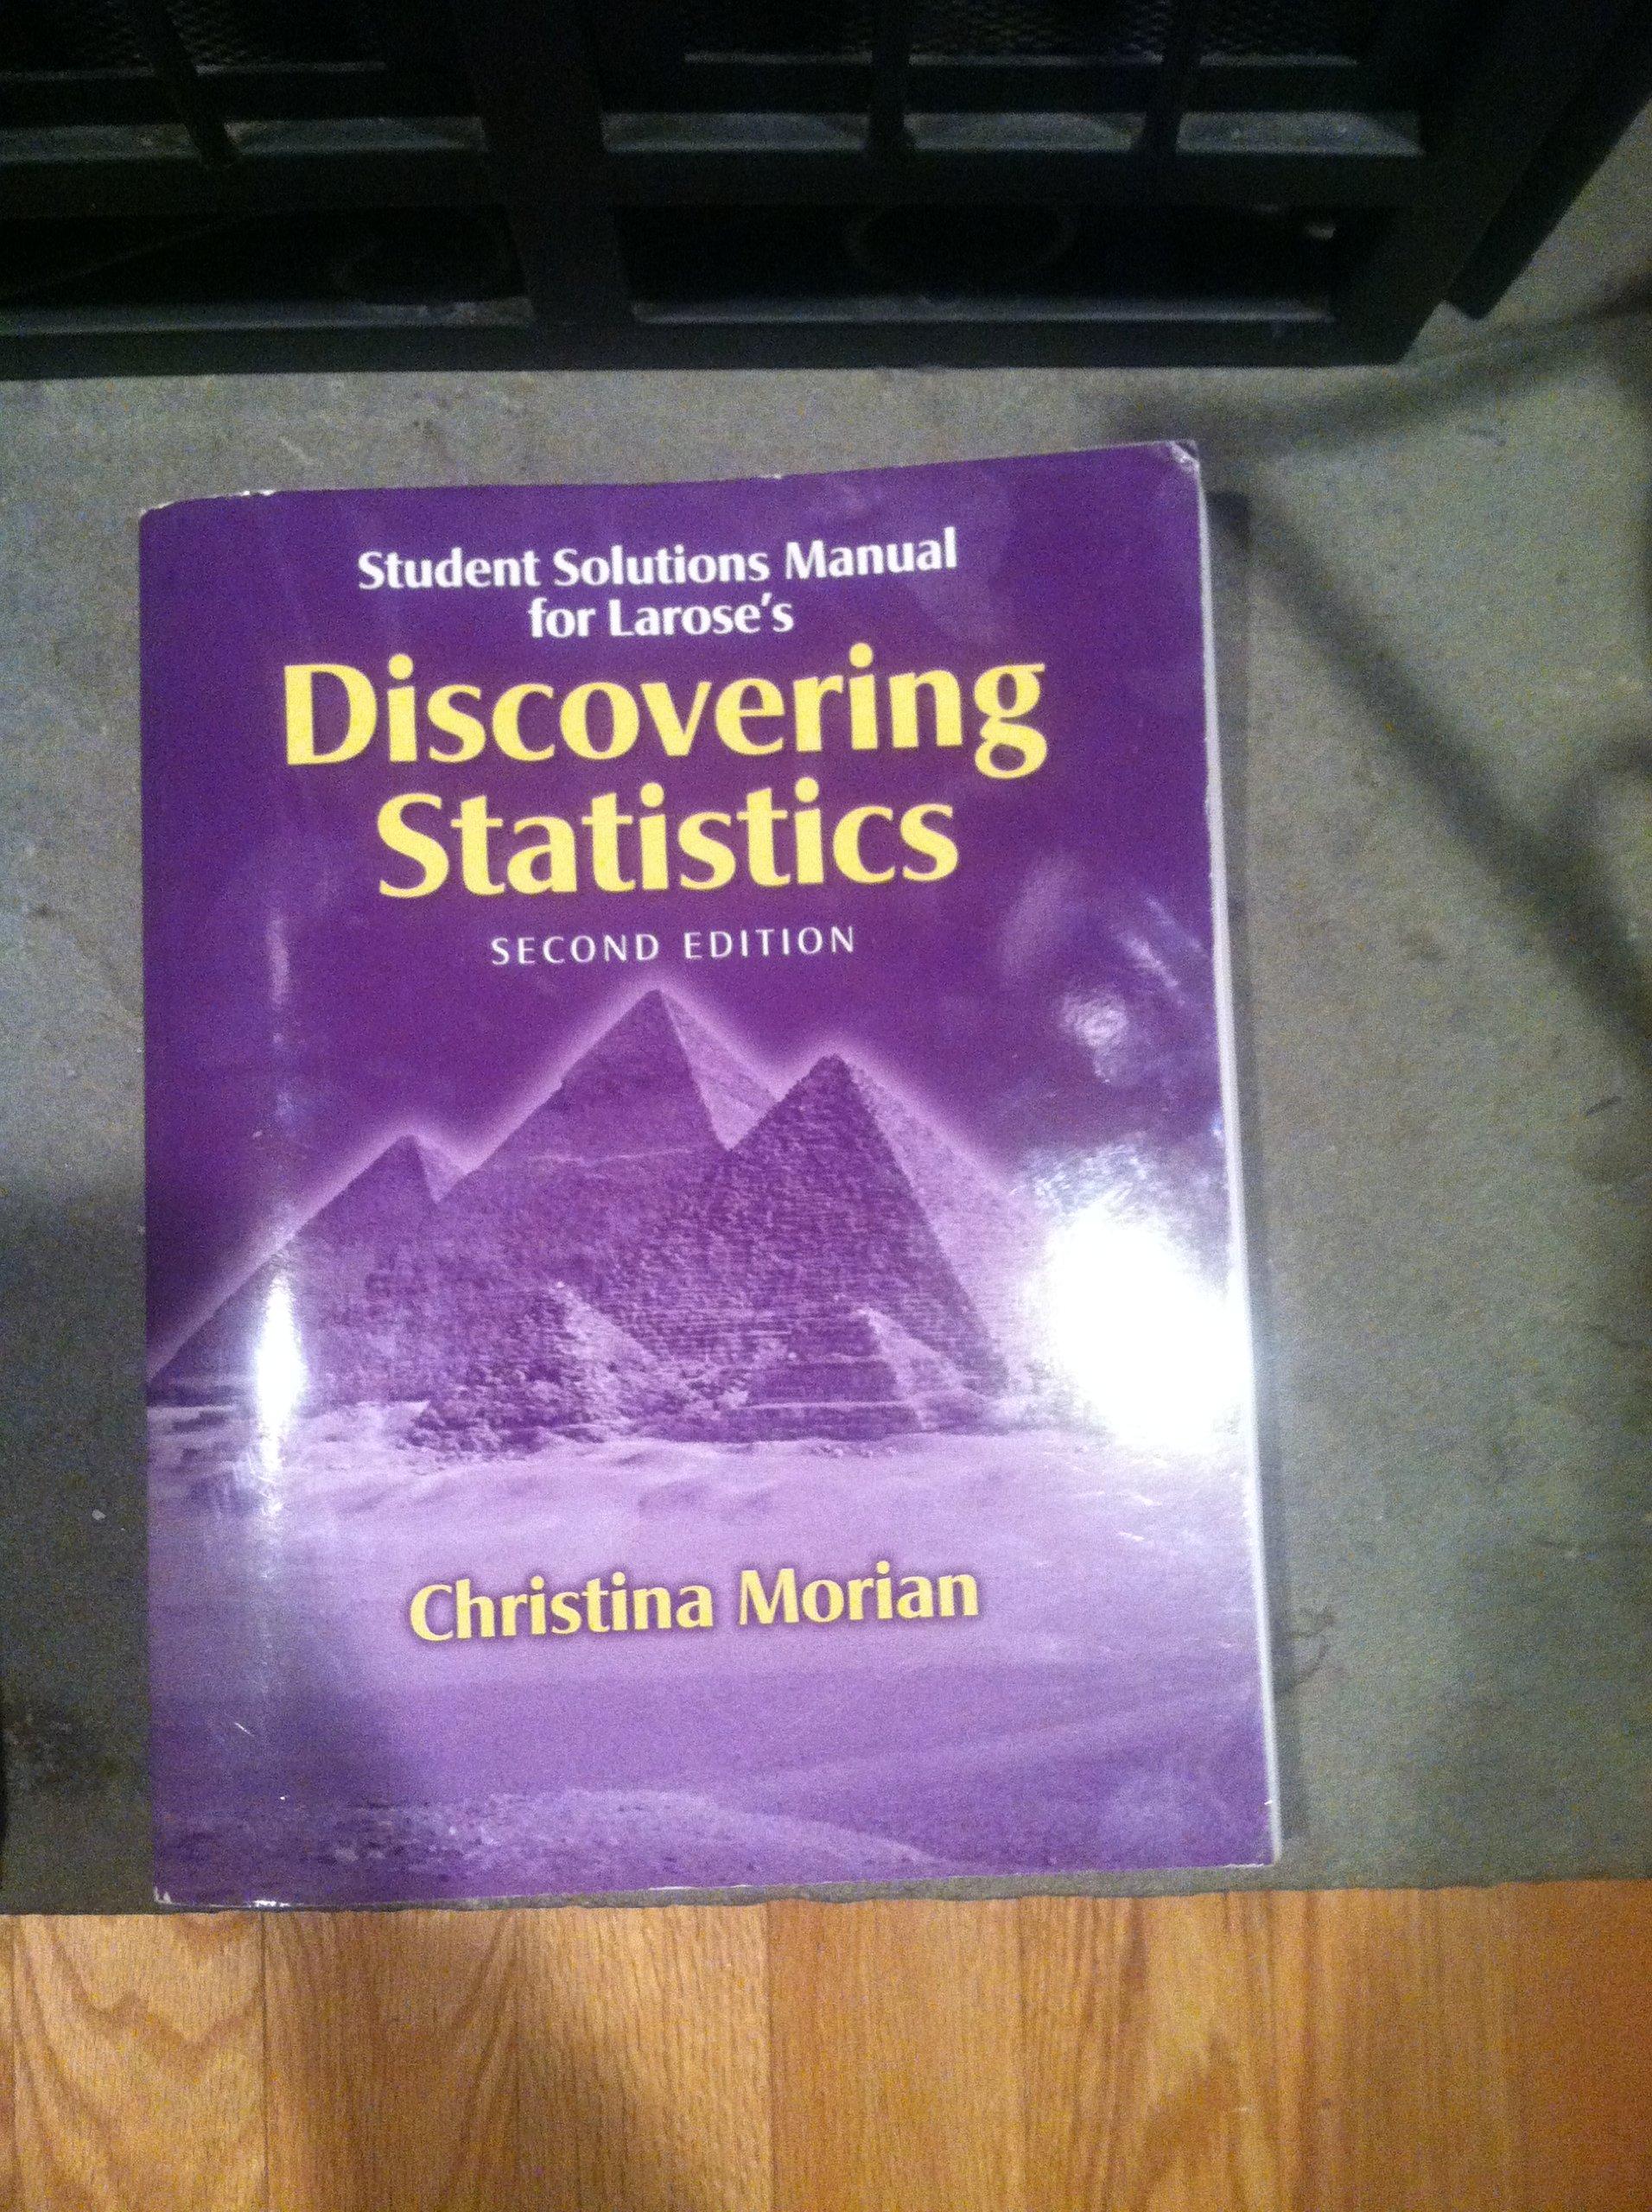 Discovering Statistics: Daniel T. Larose: 9781429279406: Amazon.com: Books